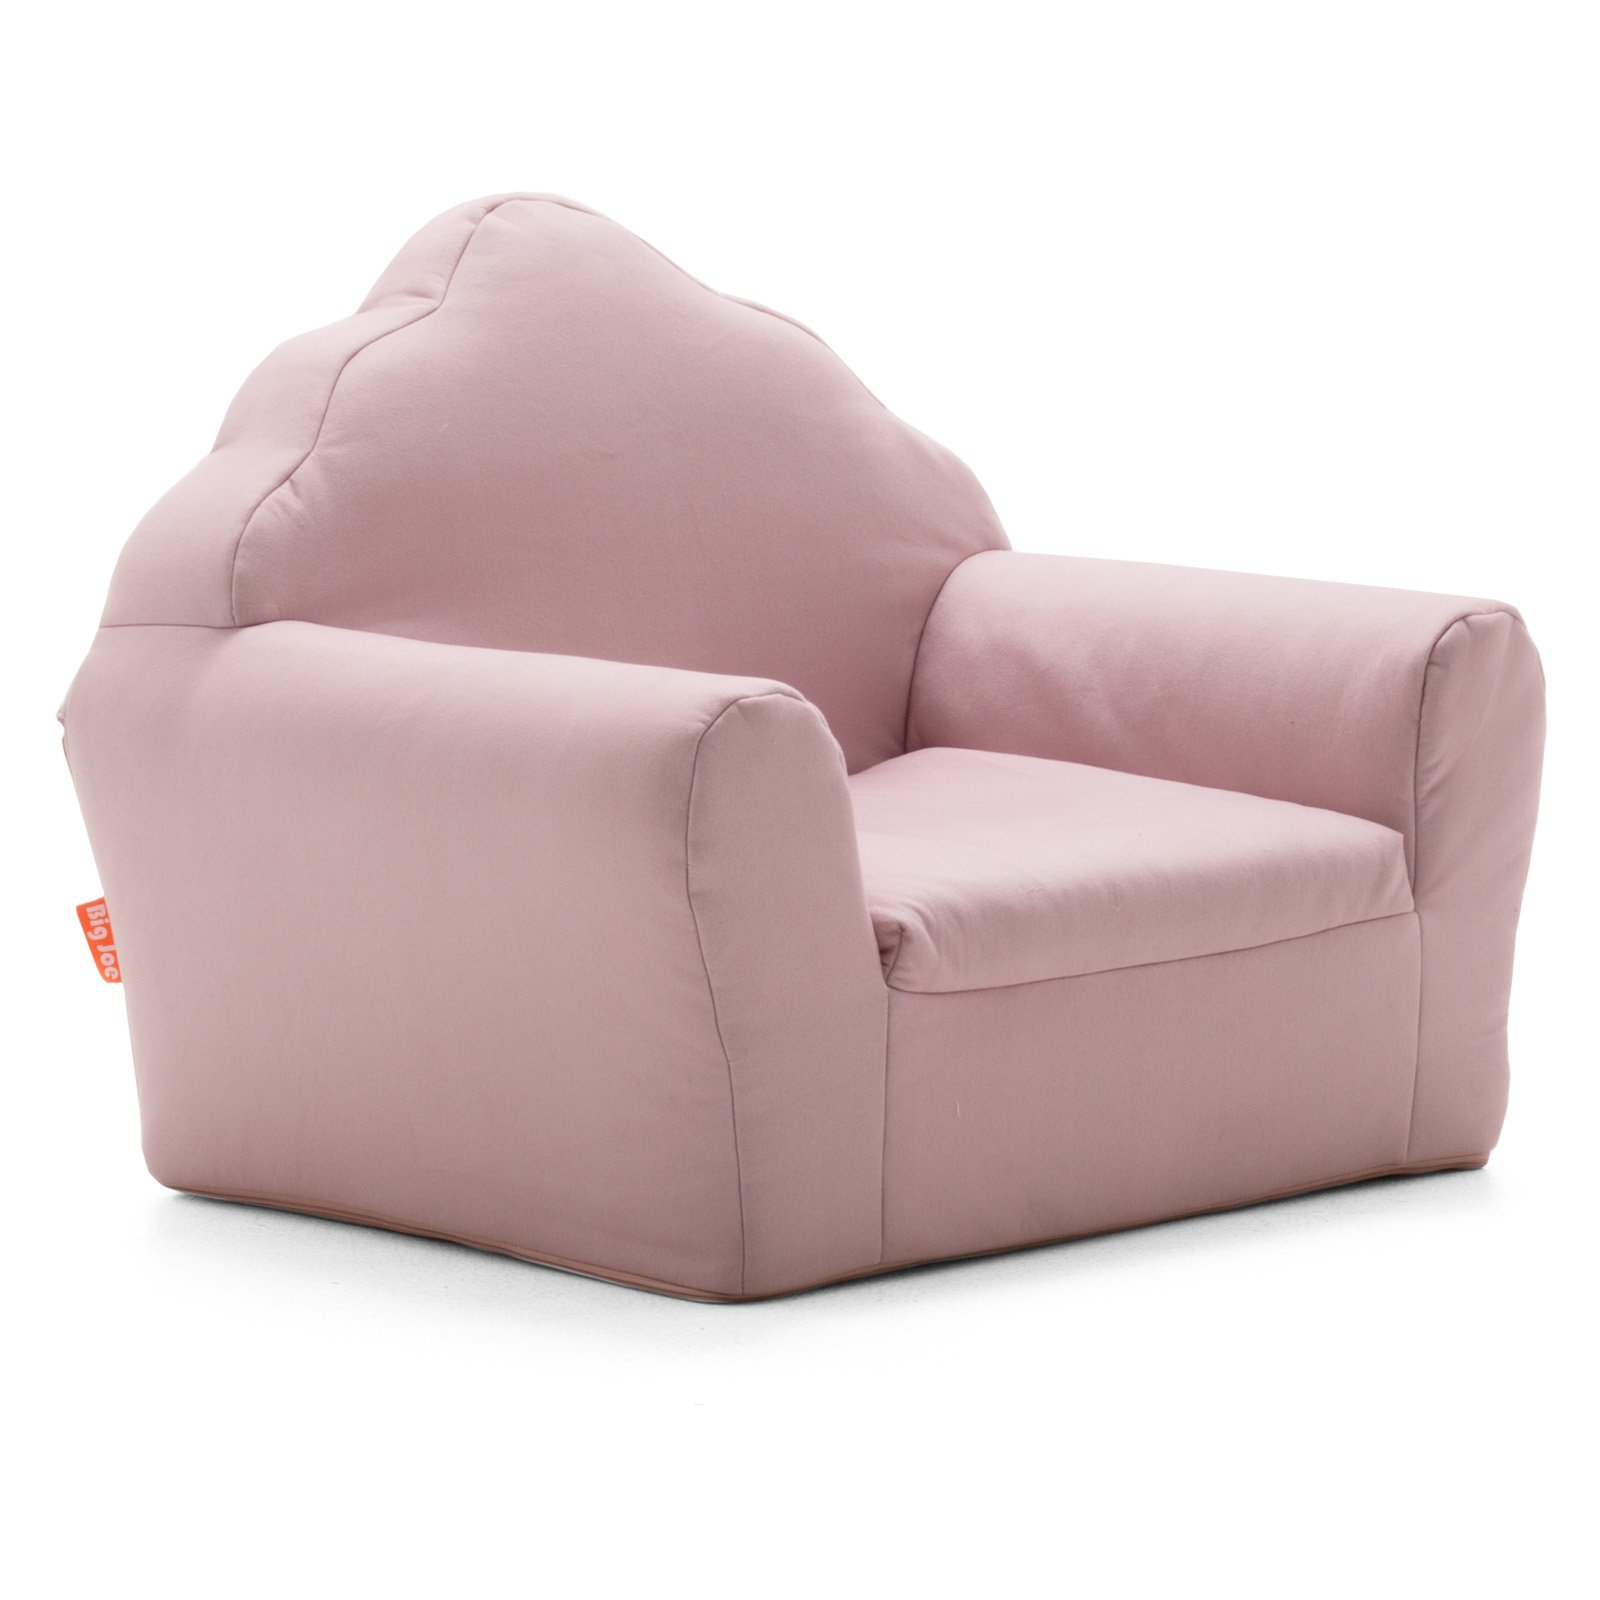 Big Joe Art Deco Kids Upholstered Chair Upholstered Kids Chair